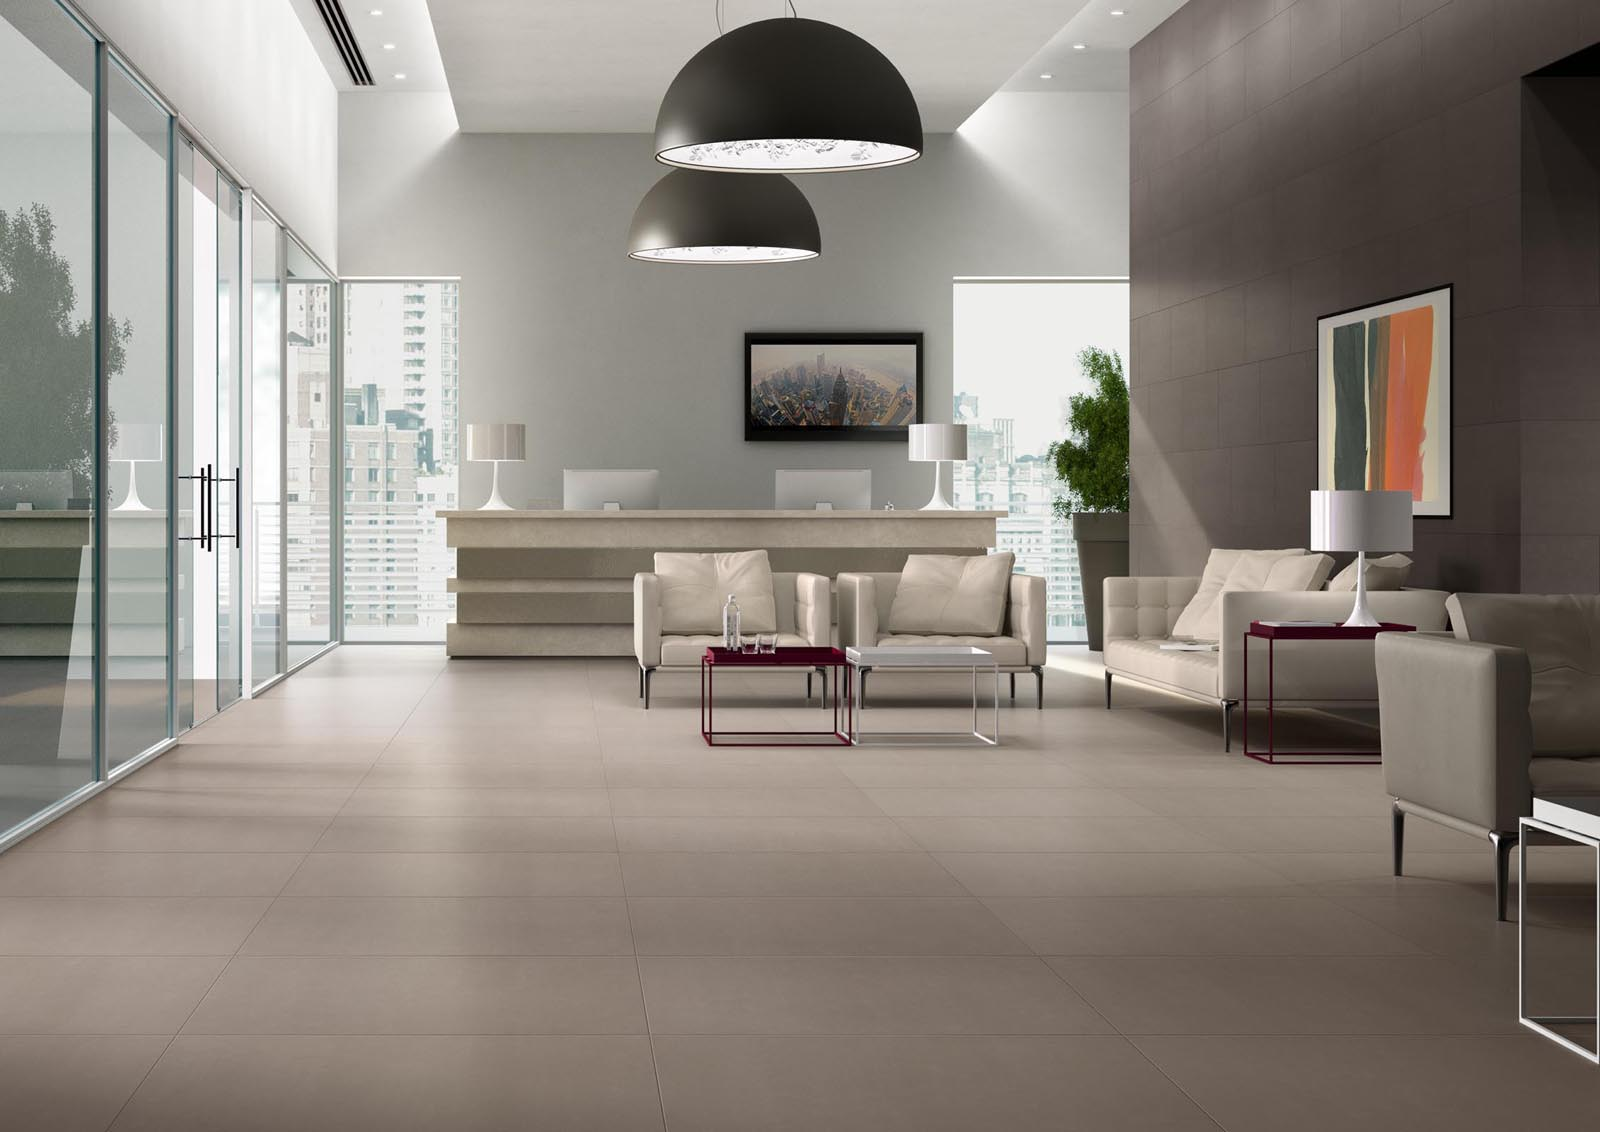 sistemn high performance technical stoneware marazzi. Black Bedroom Furniture Sets. Home Design Ideas